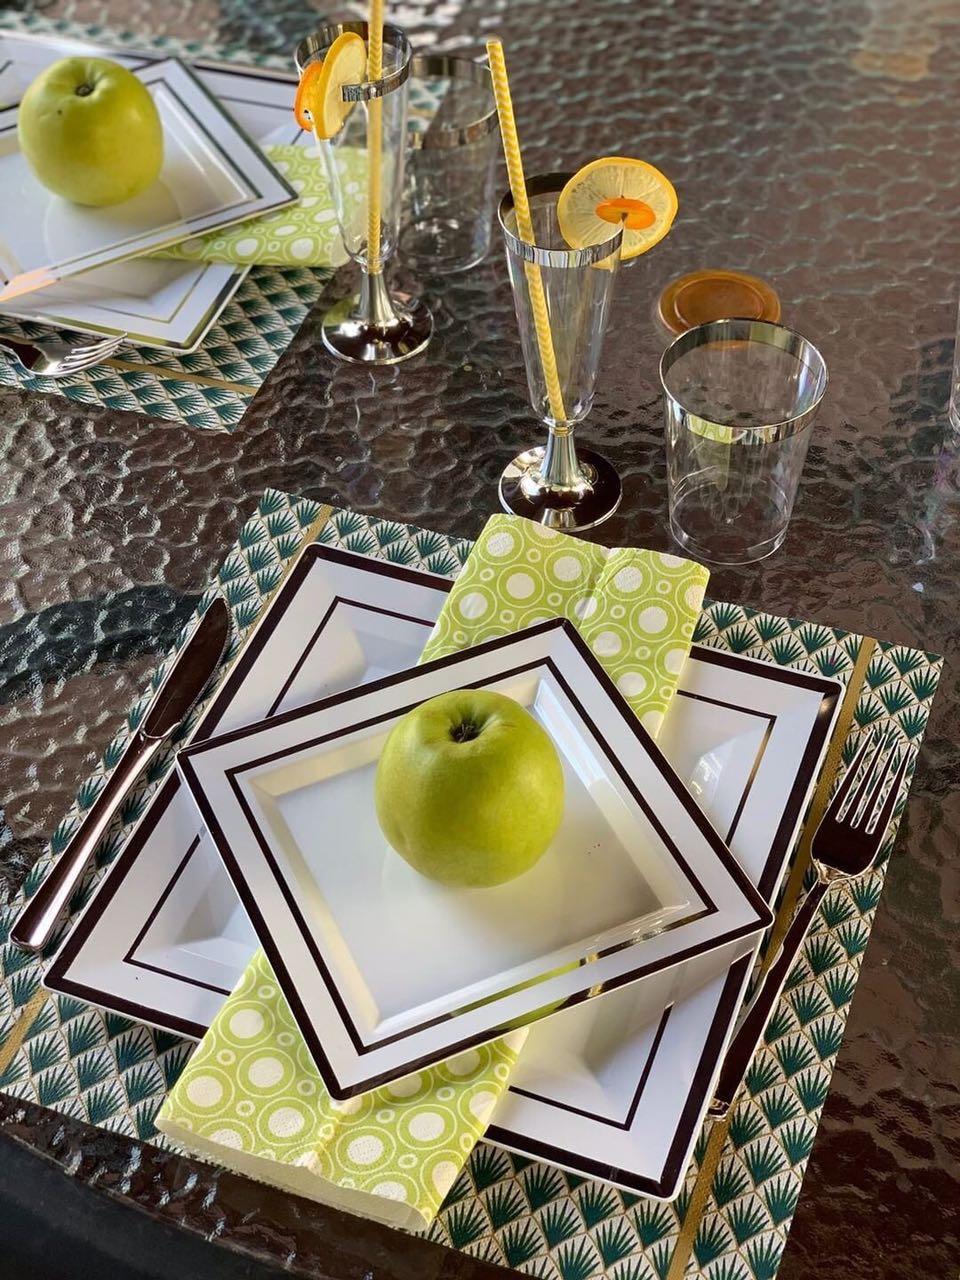 Тарелки стеклопластик для ресторанов, кафе, кенди бара,кейтеринга,хореки оптом от производителя CFP 6 шт 190мм